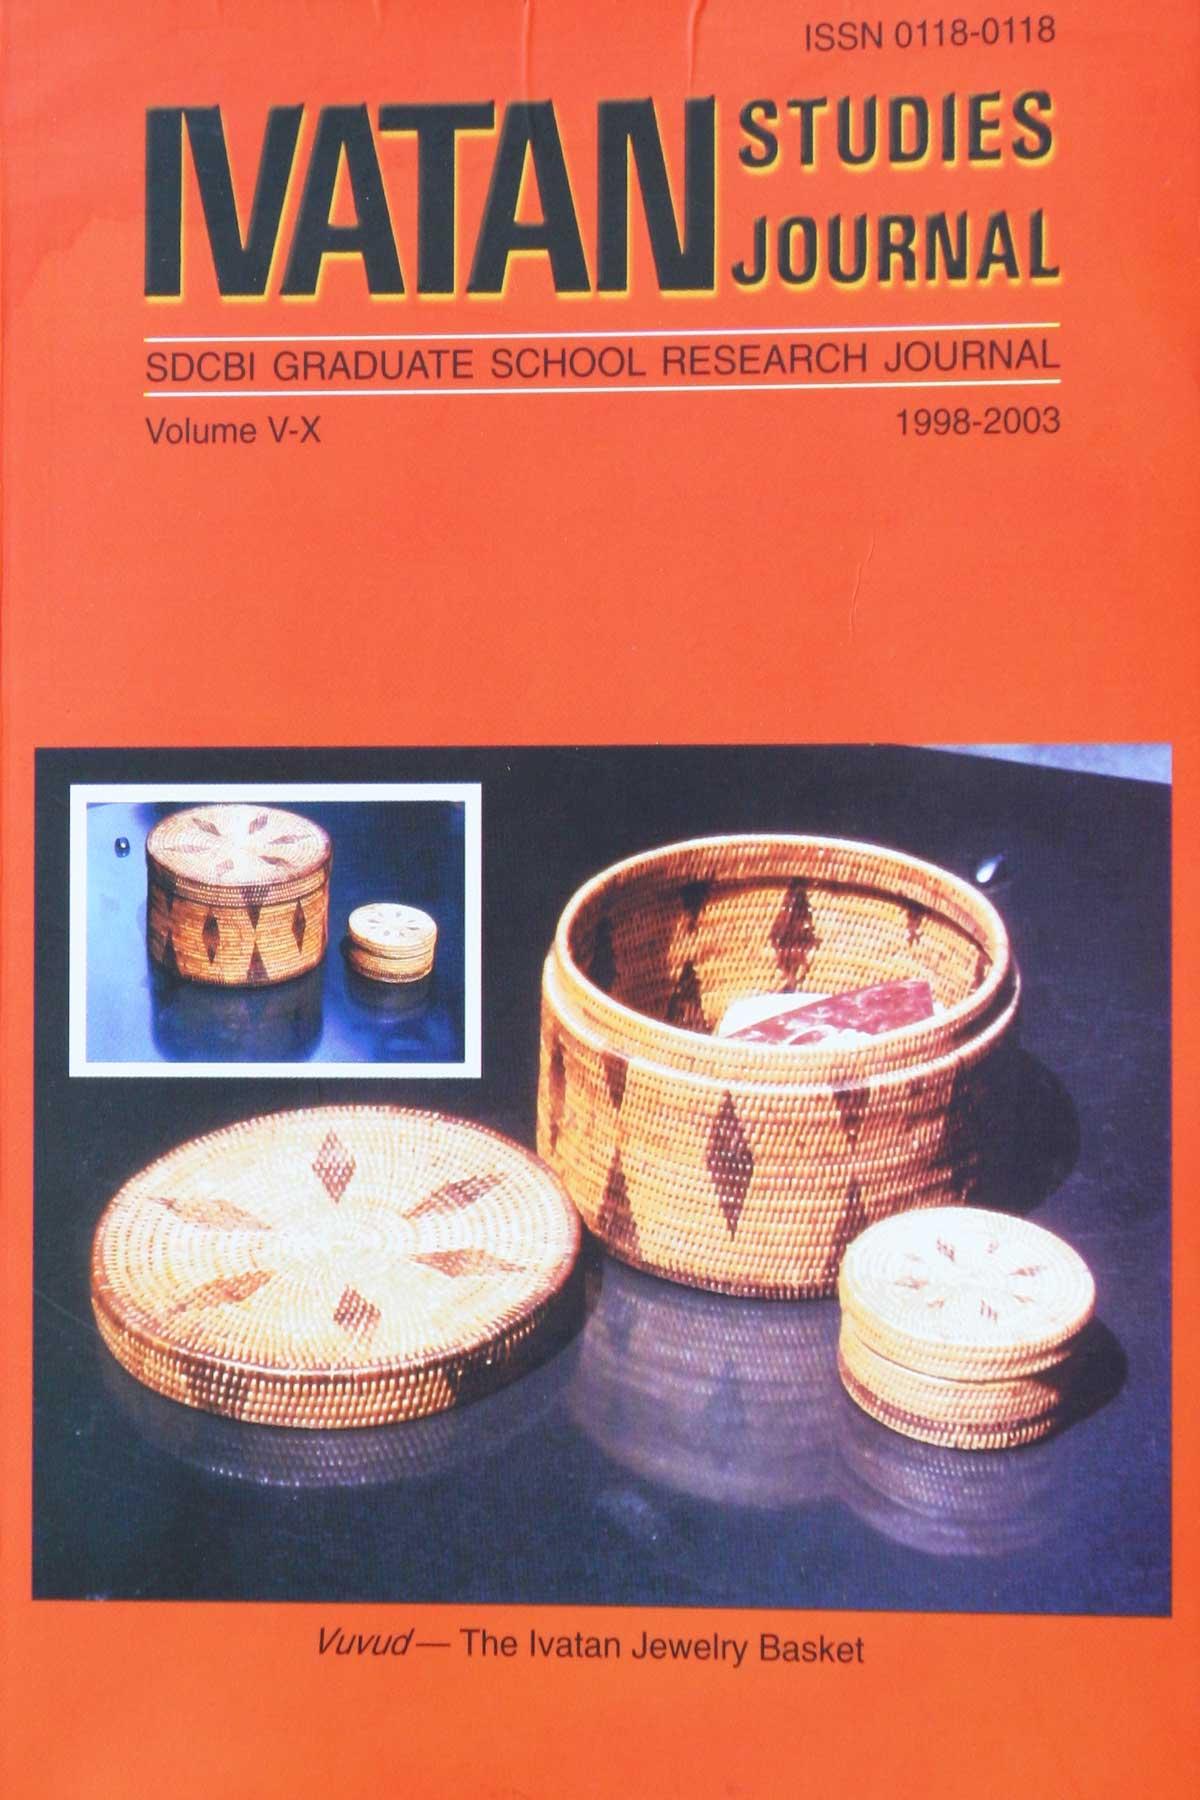 Ivatan Studies Journal - Graduate School Research Journal - Photo Dr Steven A Martin - Basco Batanes Philippines 2006